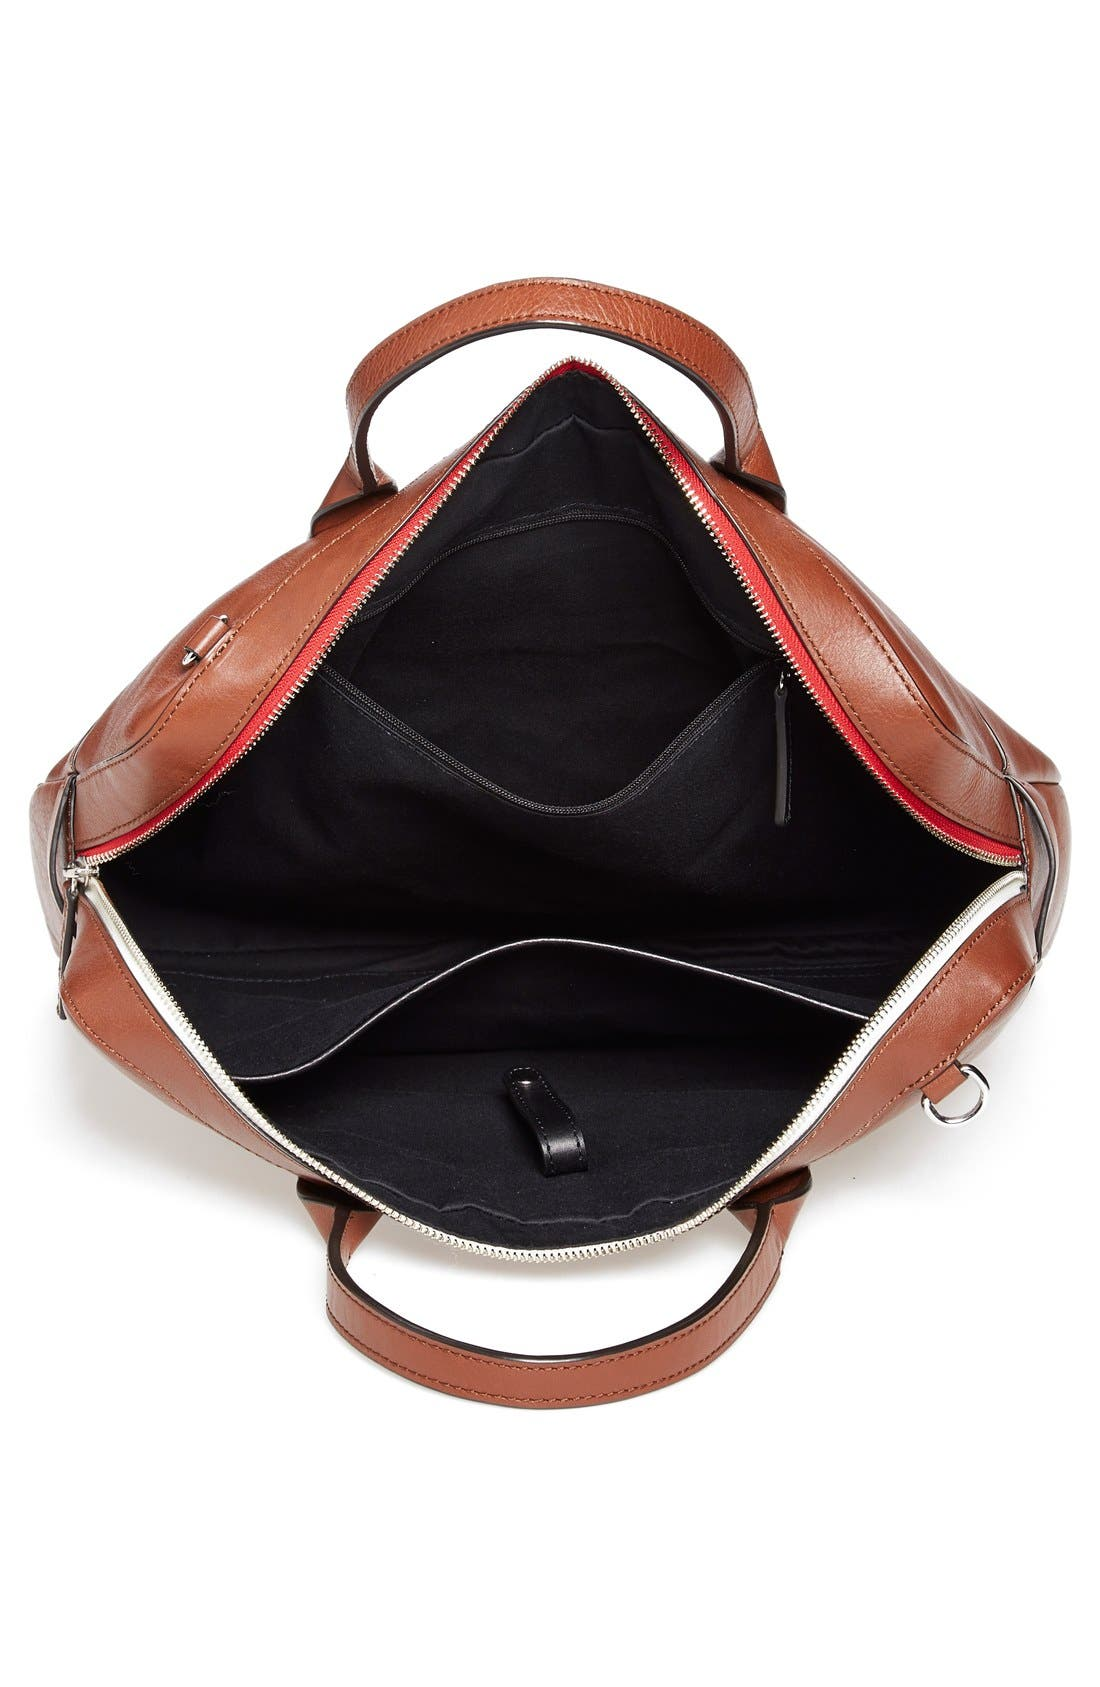 Ben Minkoff 'Fulton' Leather Briefcase,                             Alternate thumbnail 3, color,                             233